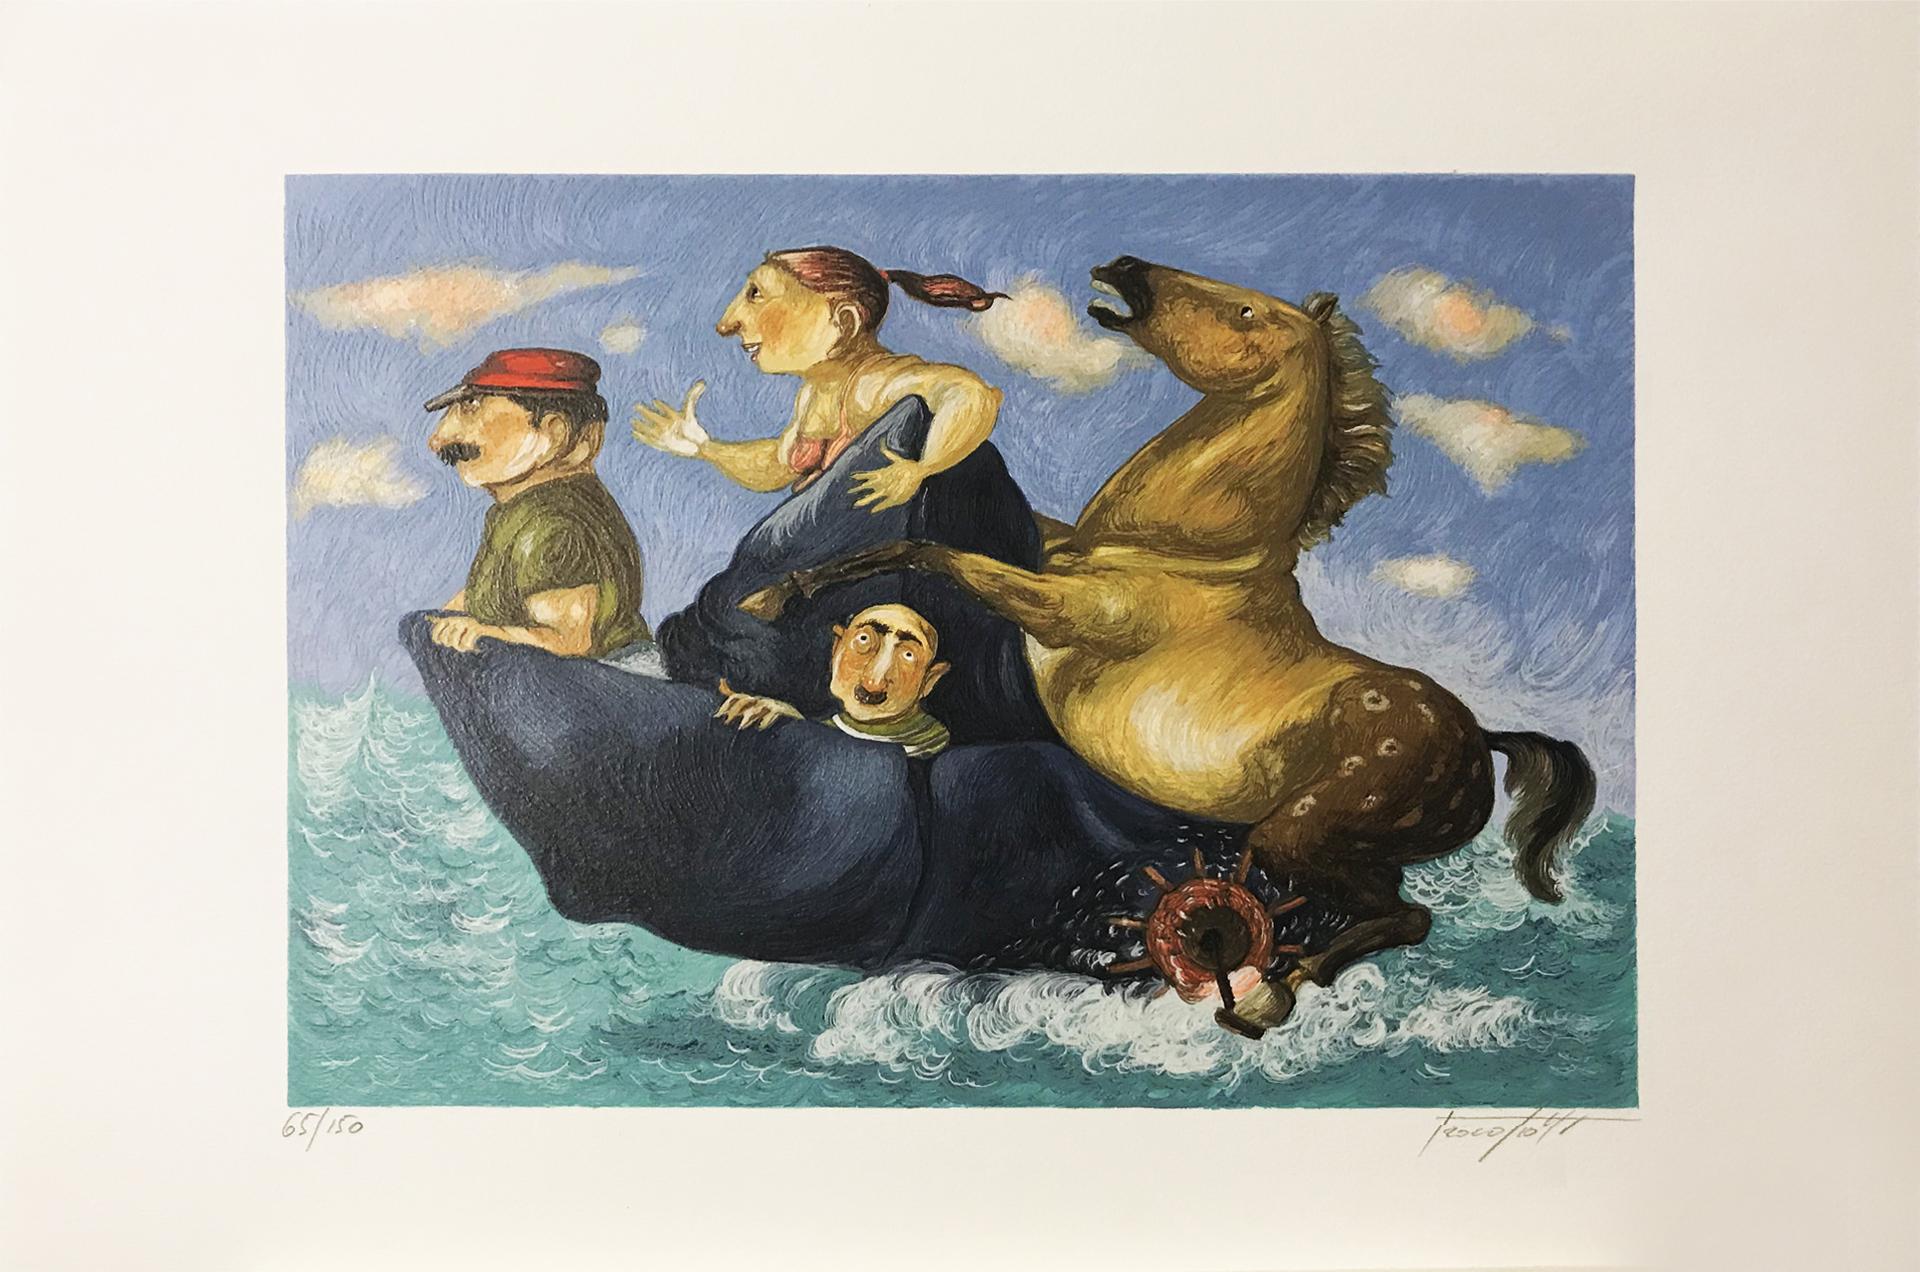 cavallo marino